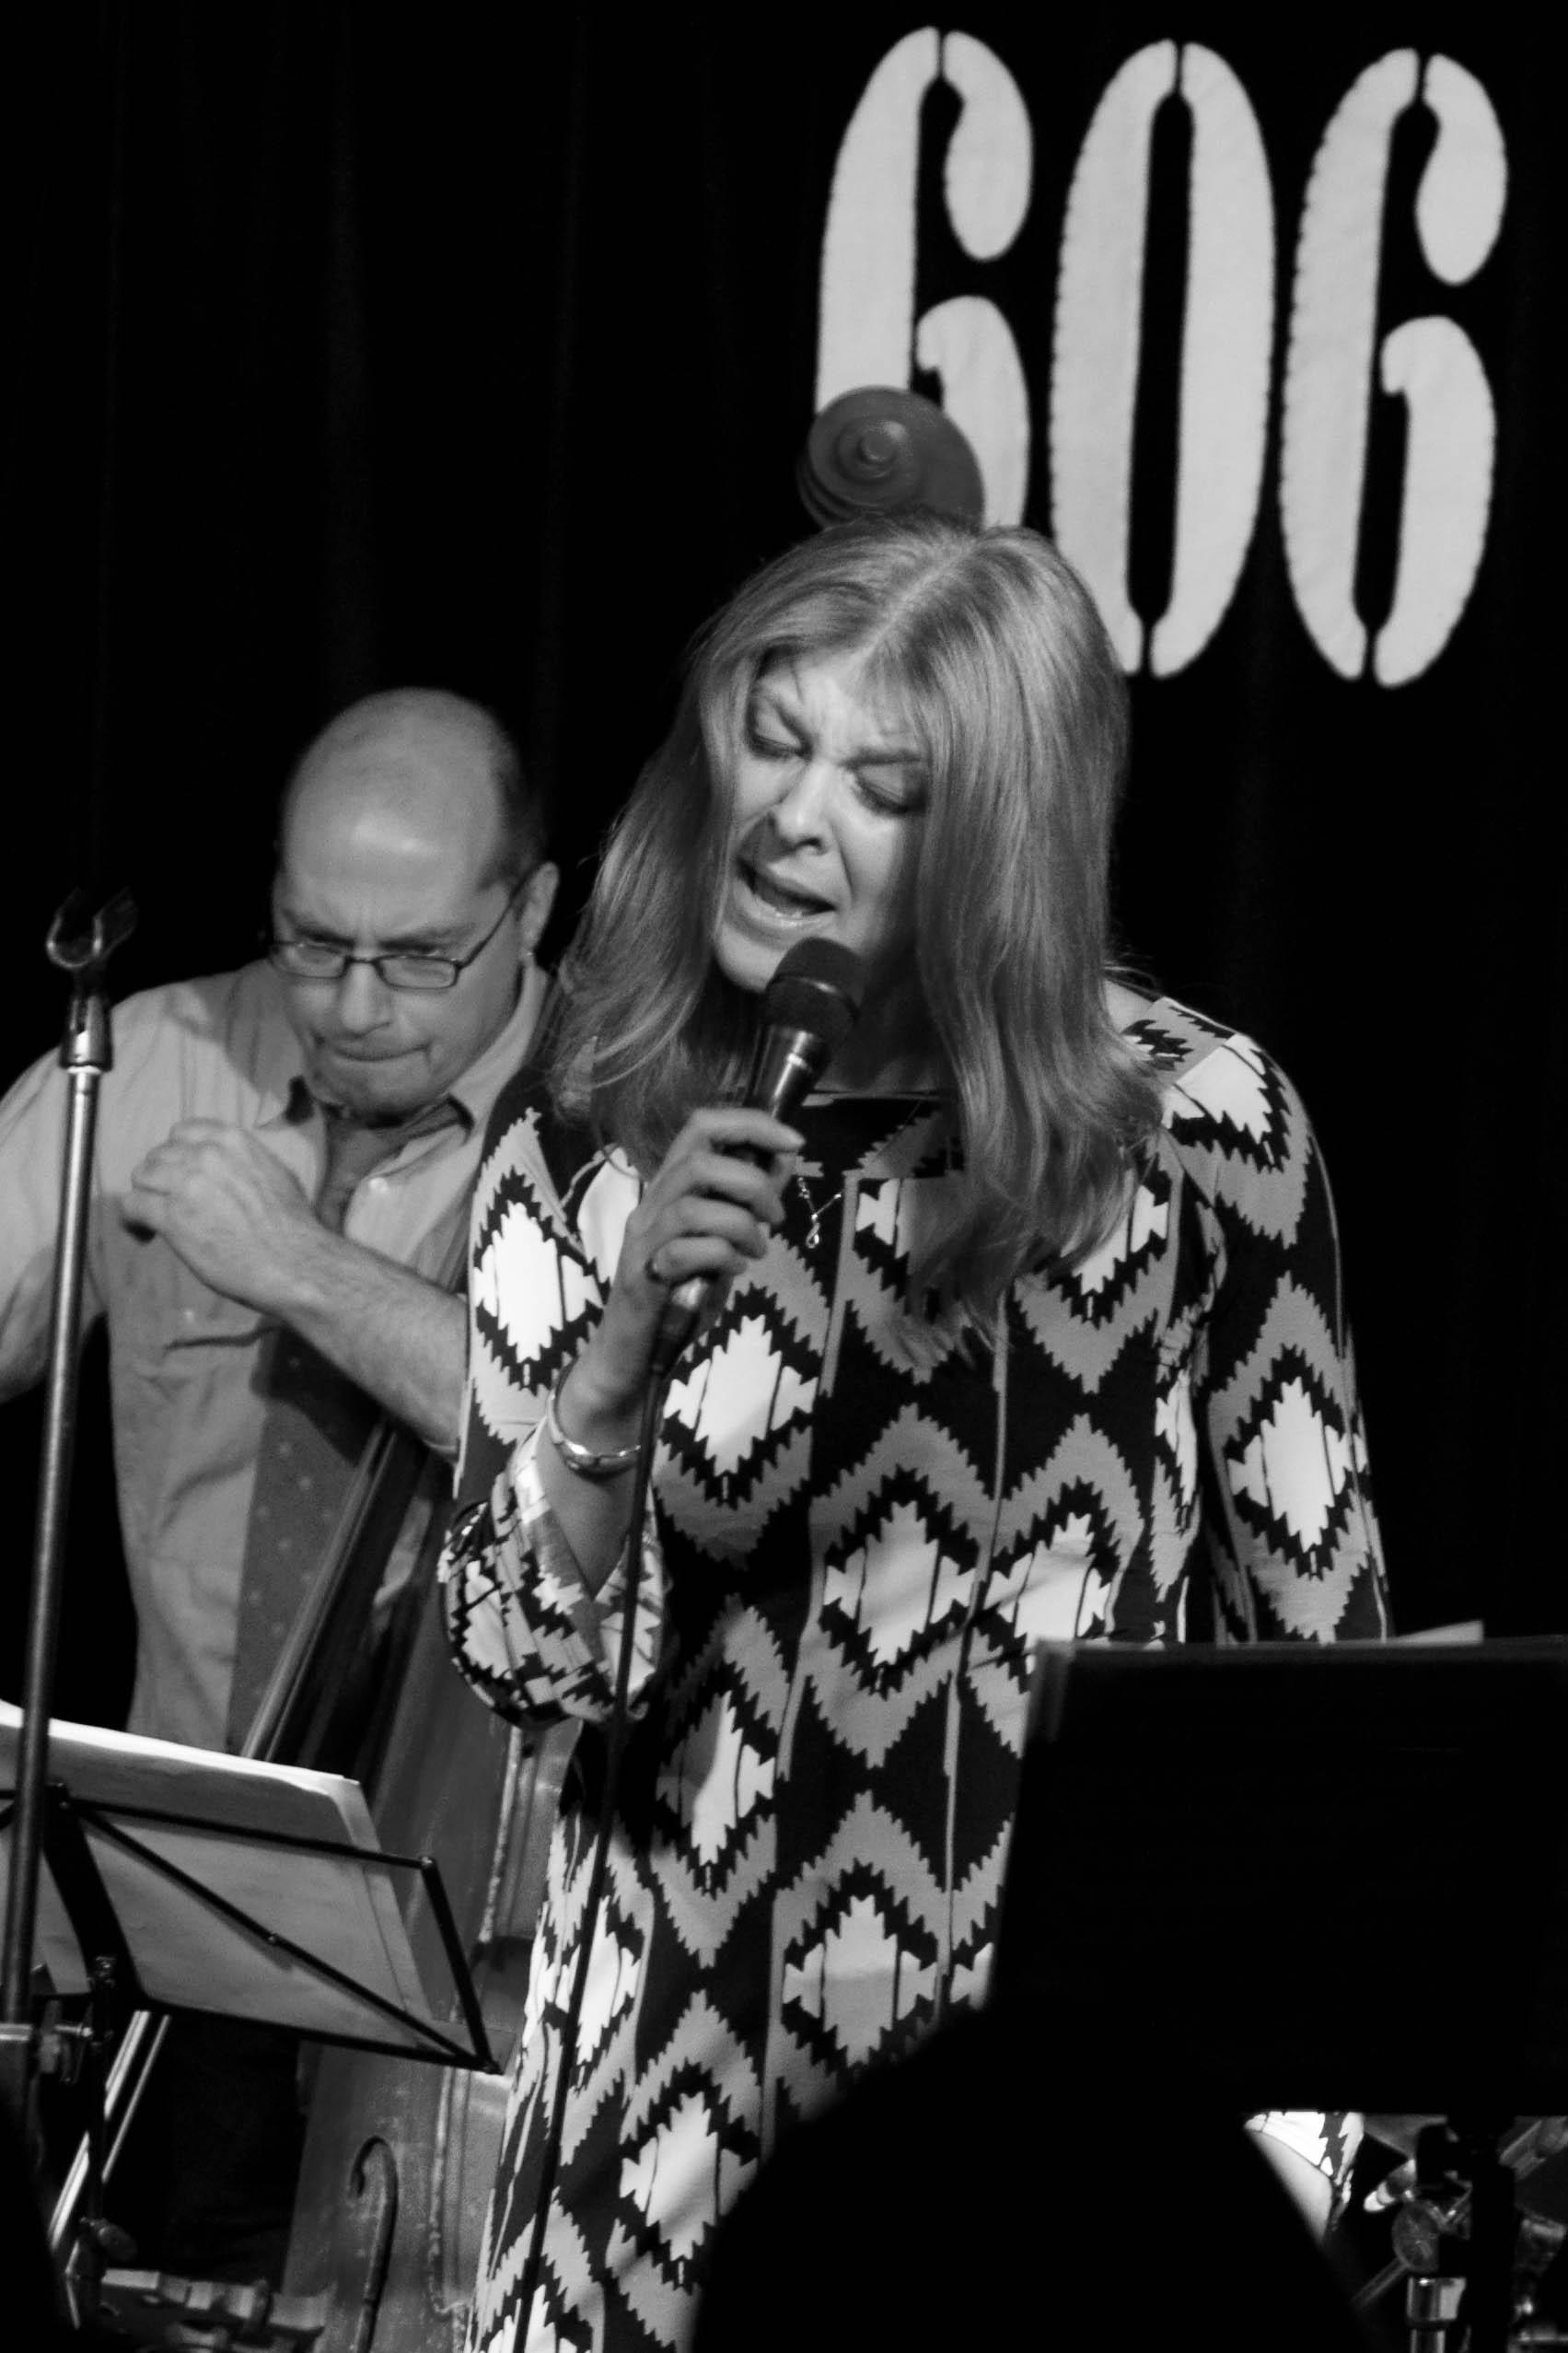 Jacqui Hicks with Simon Thorpe - Bass